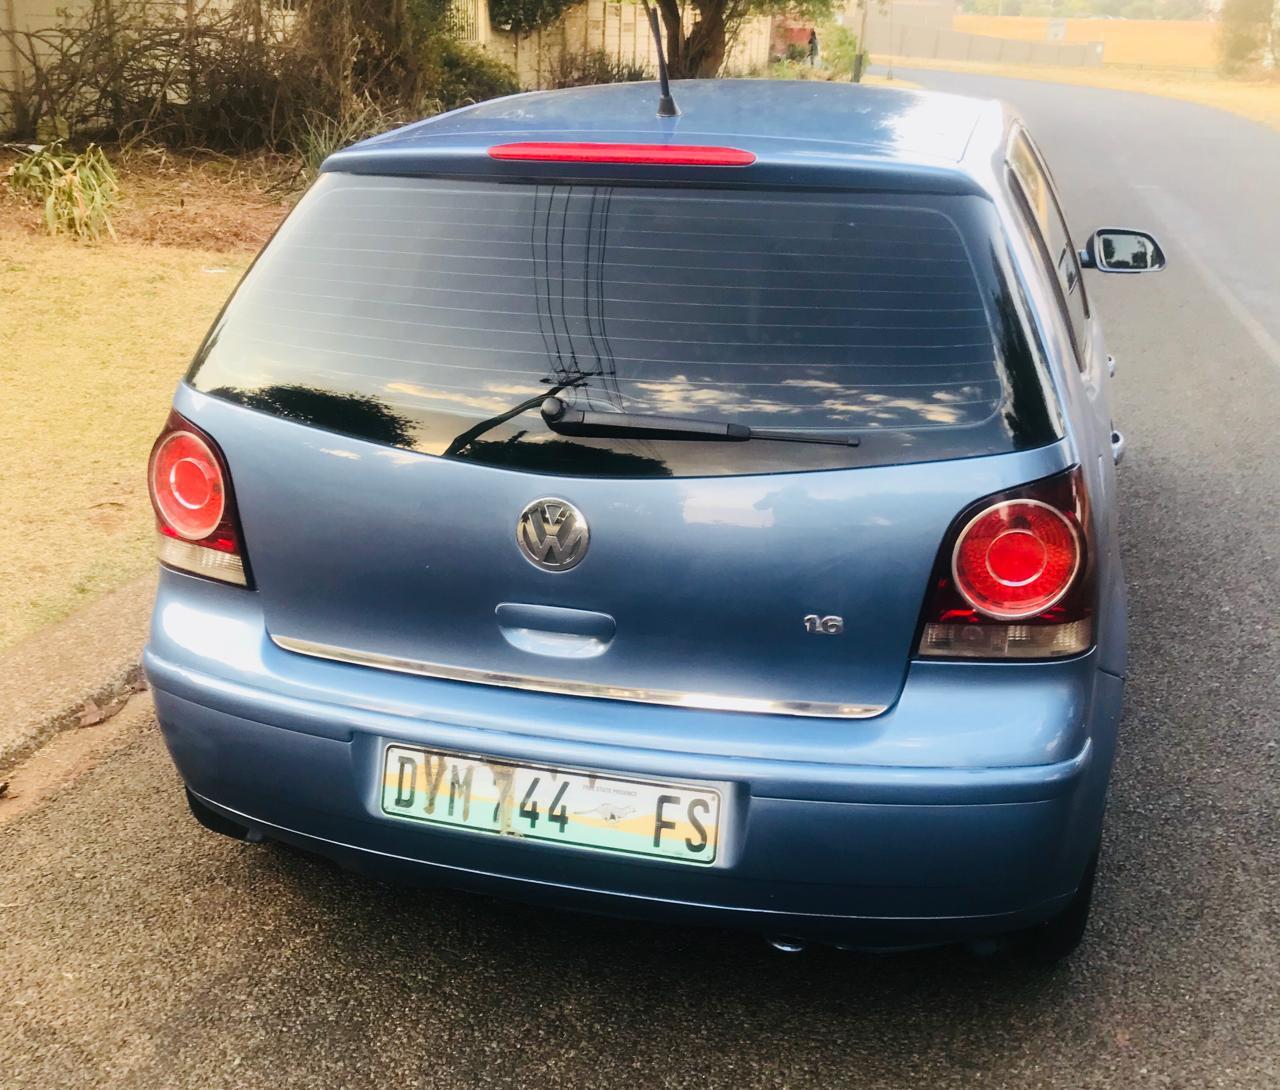 2007 VW Polo 1.6 Comfortline